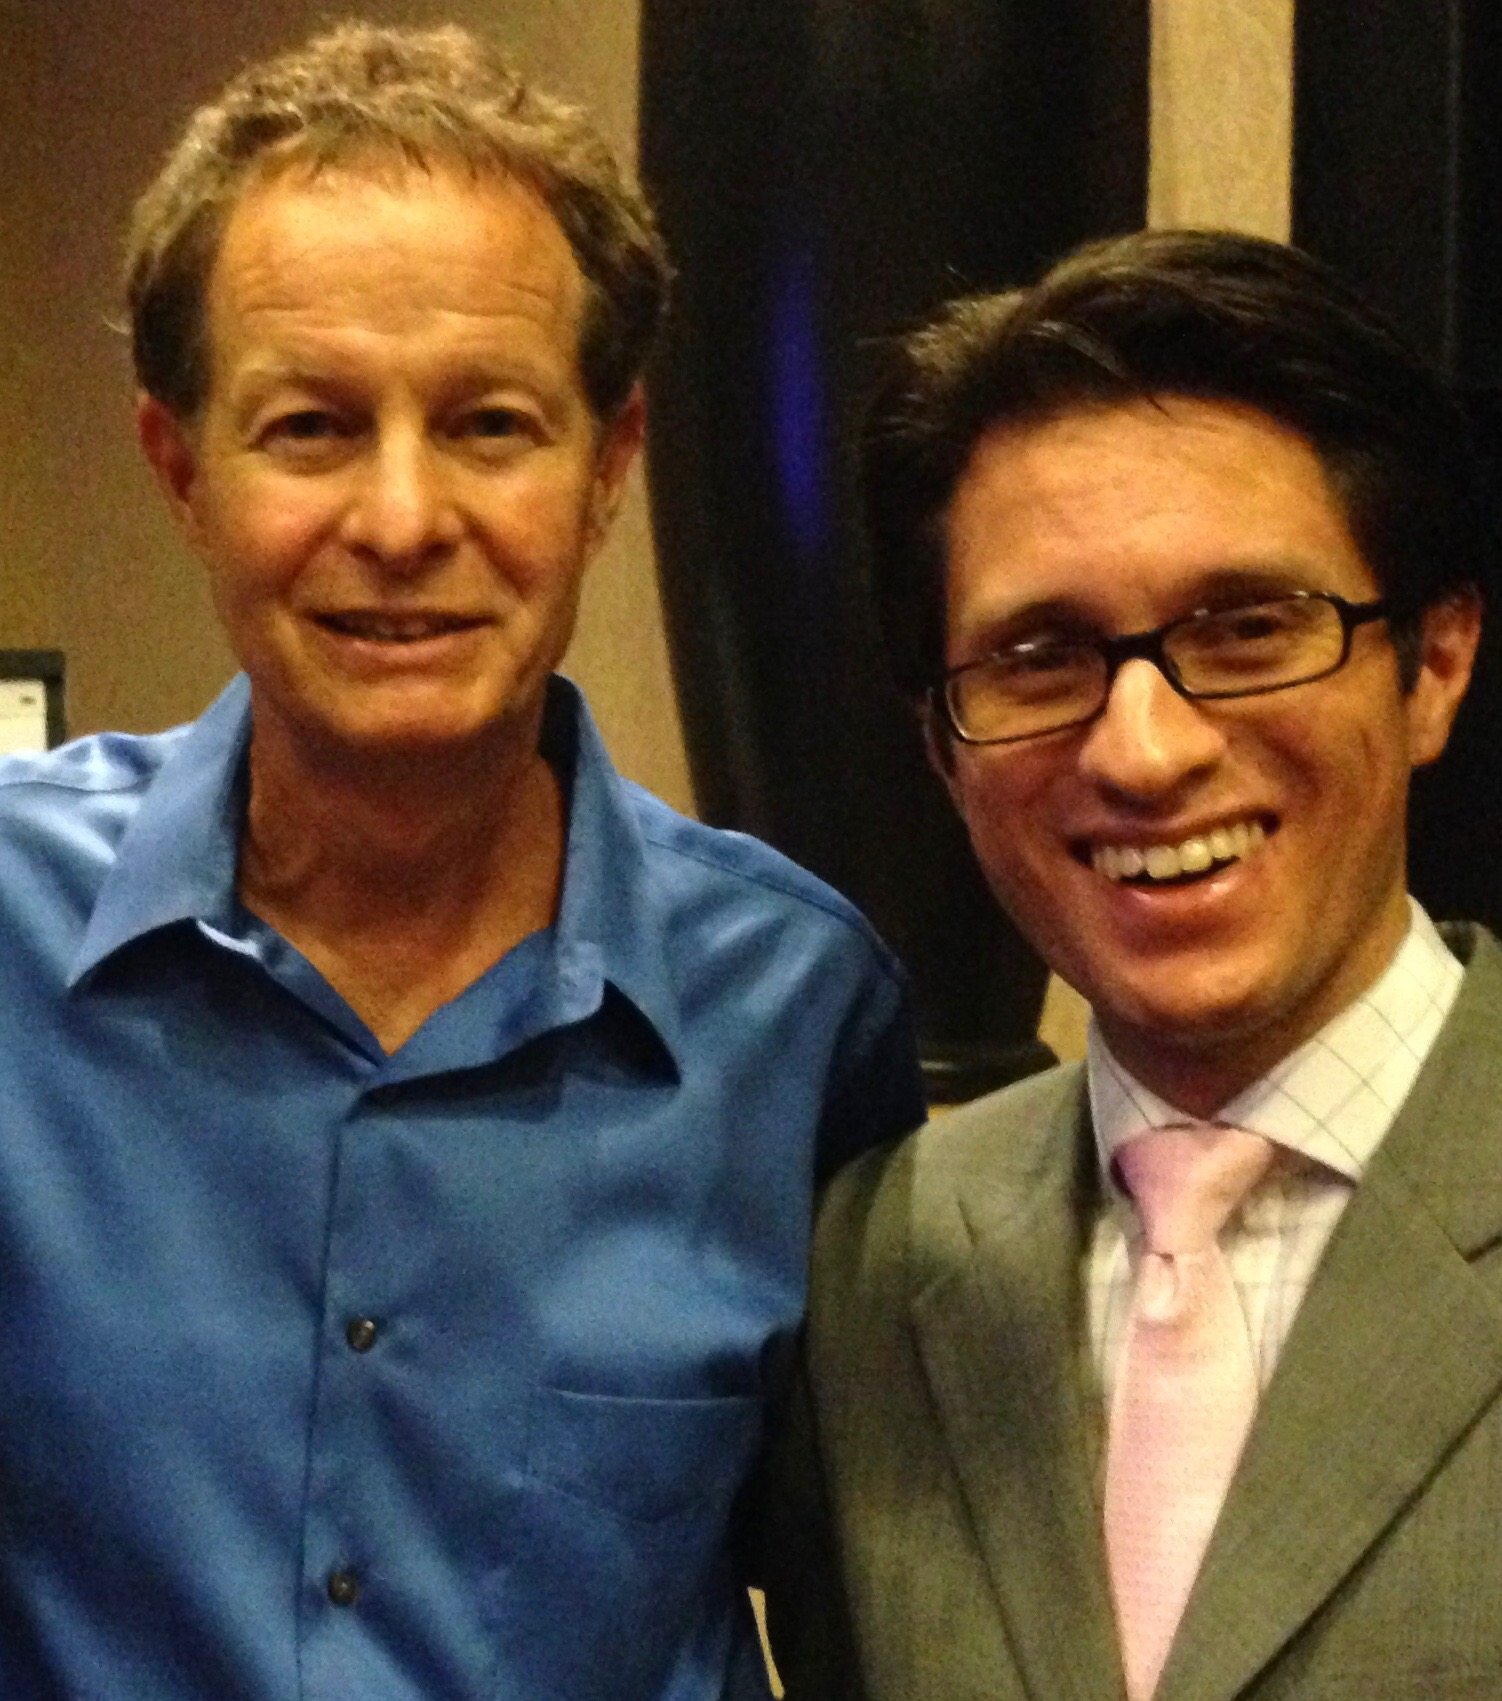 Dan Mangru and John Mackey - Co-CEO of Whole Foods